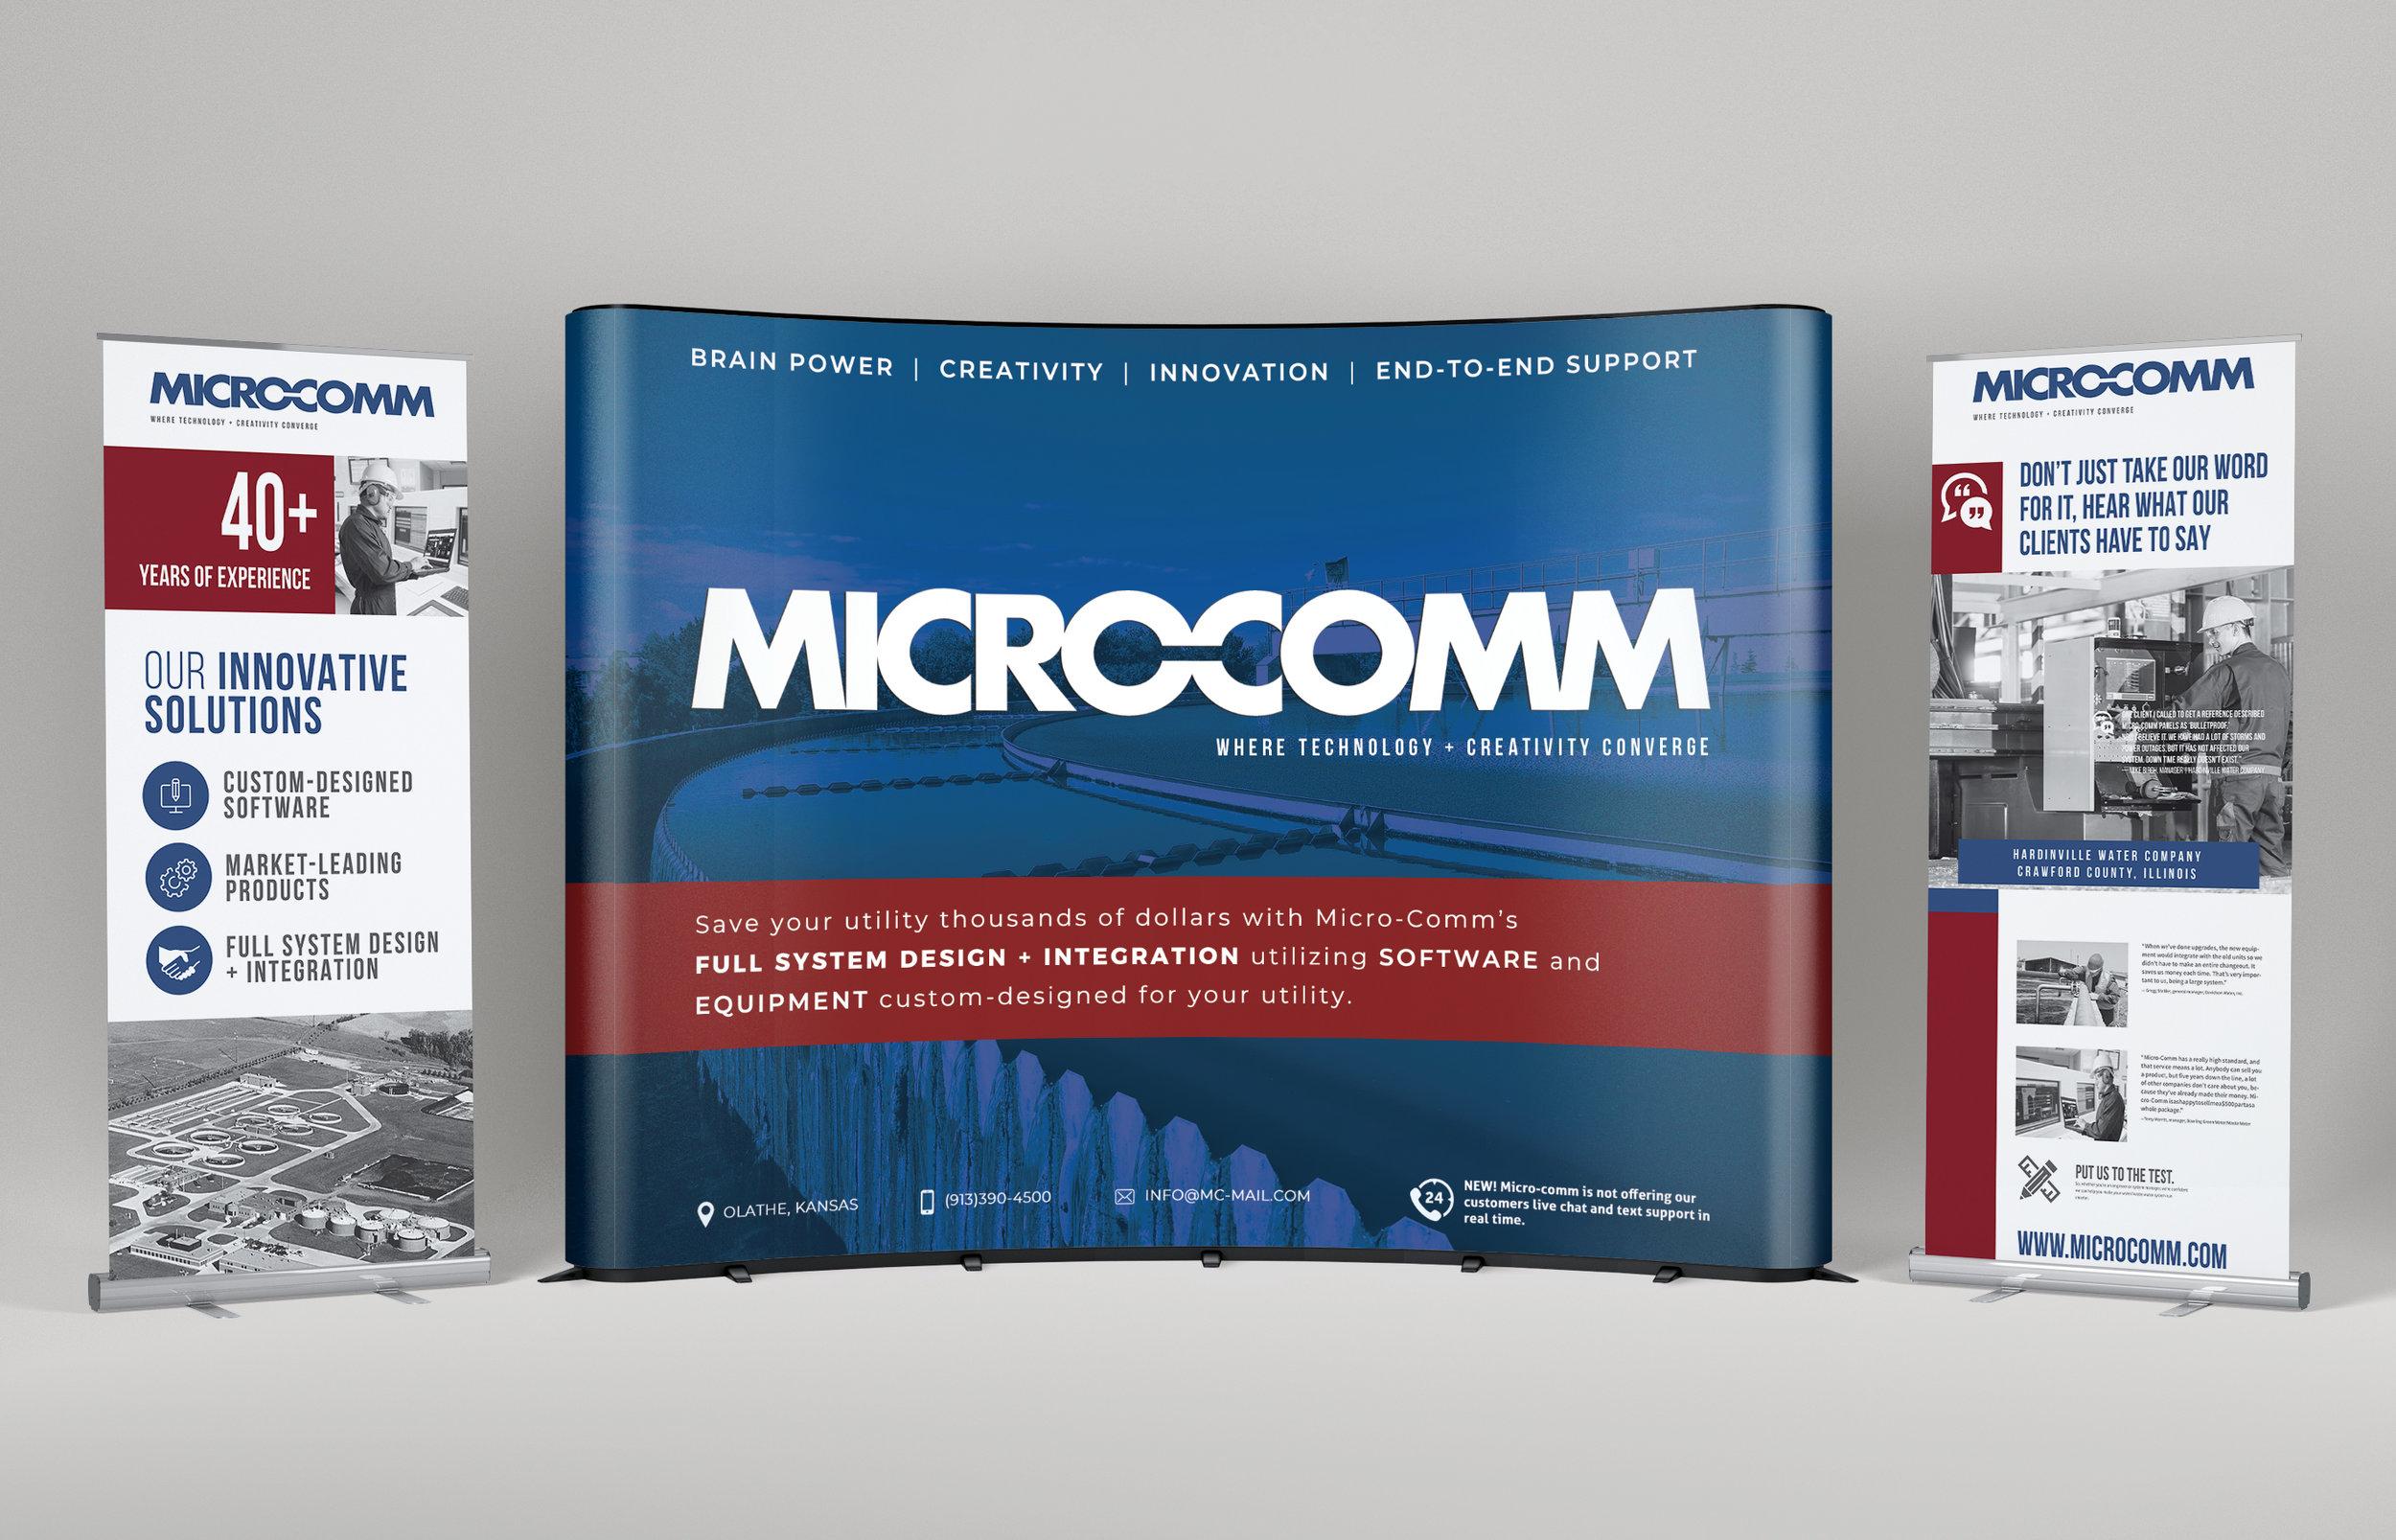 V.2 MICROCOMM 1 Banner 2 Roll-upsV.1 MICROCOMM 3 panel roll-ups 2.jpg